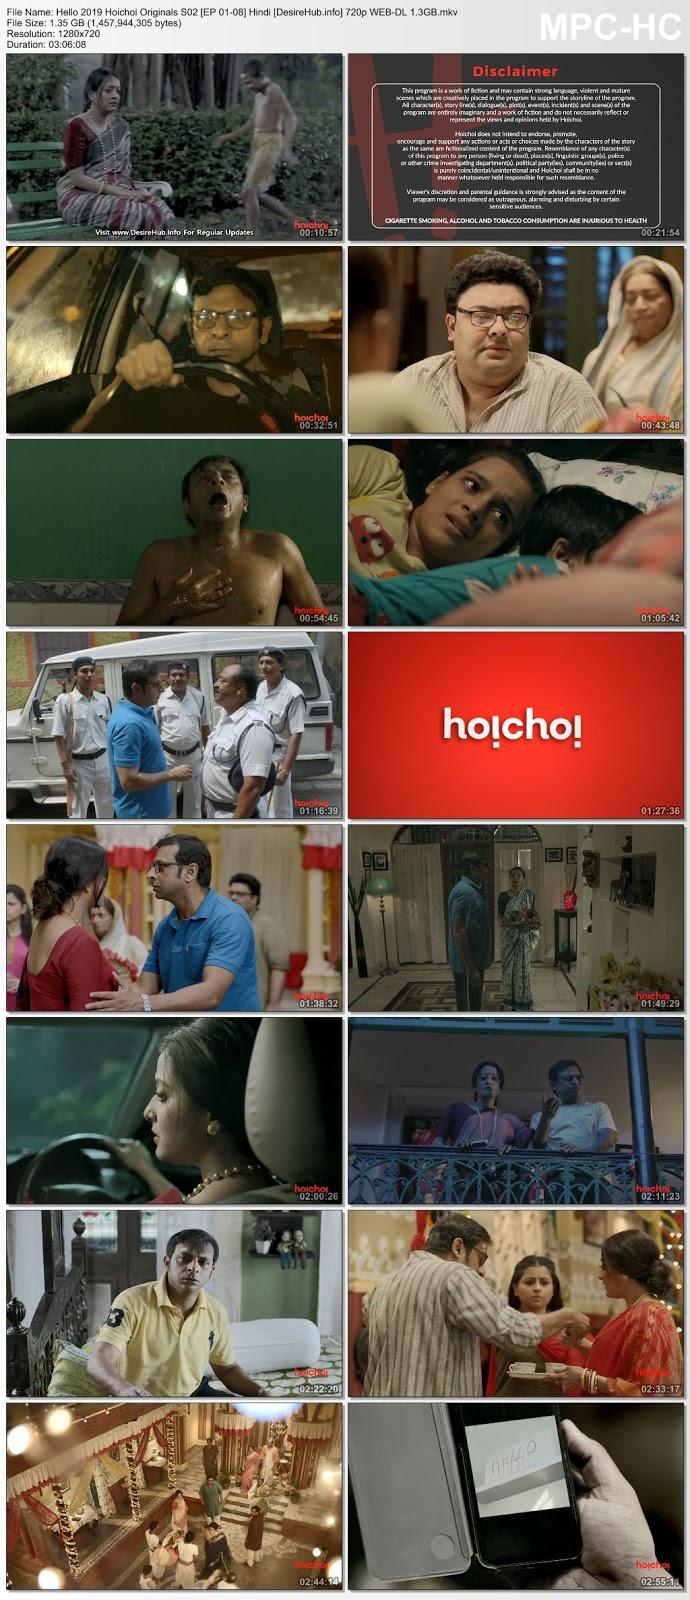 Hello 2019 Hoichoi Originals S02 [EP 01-08] Hindi 720p WEB-DL 1.3GB Desirehub